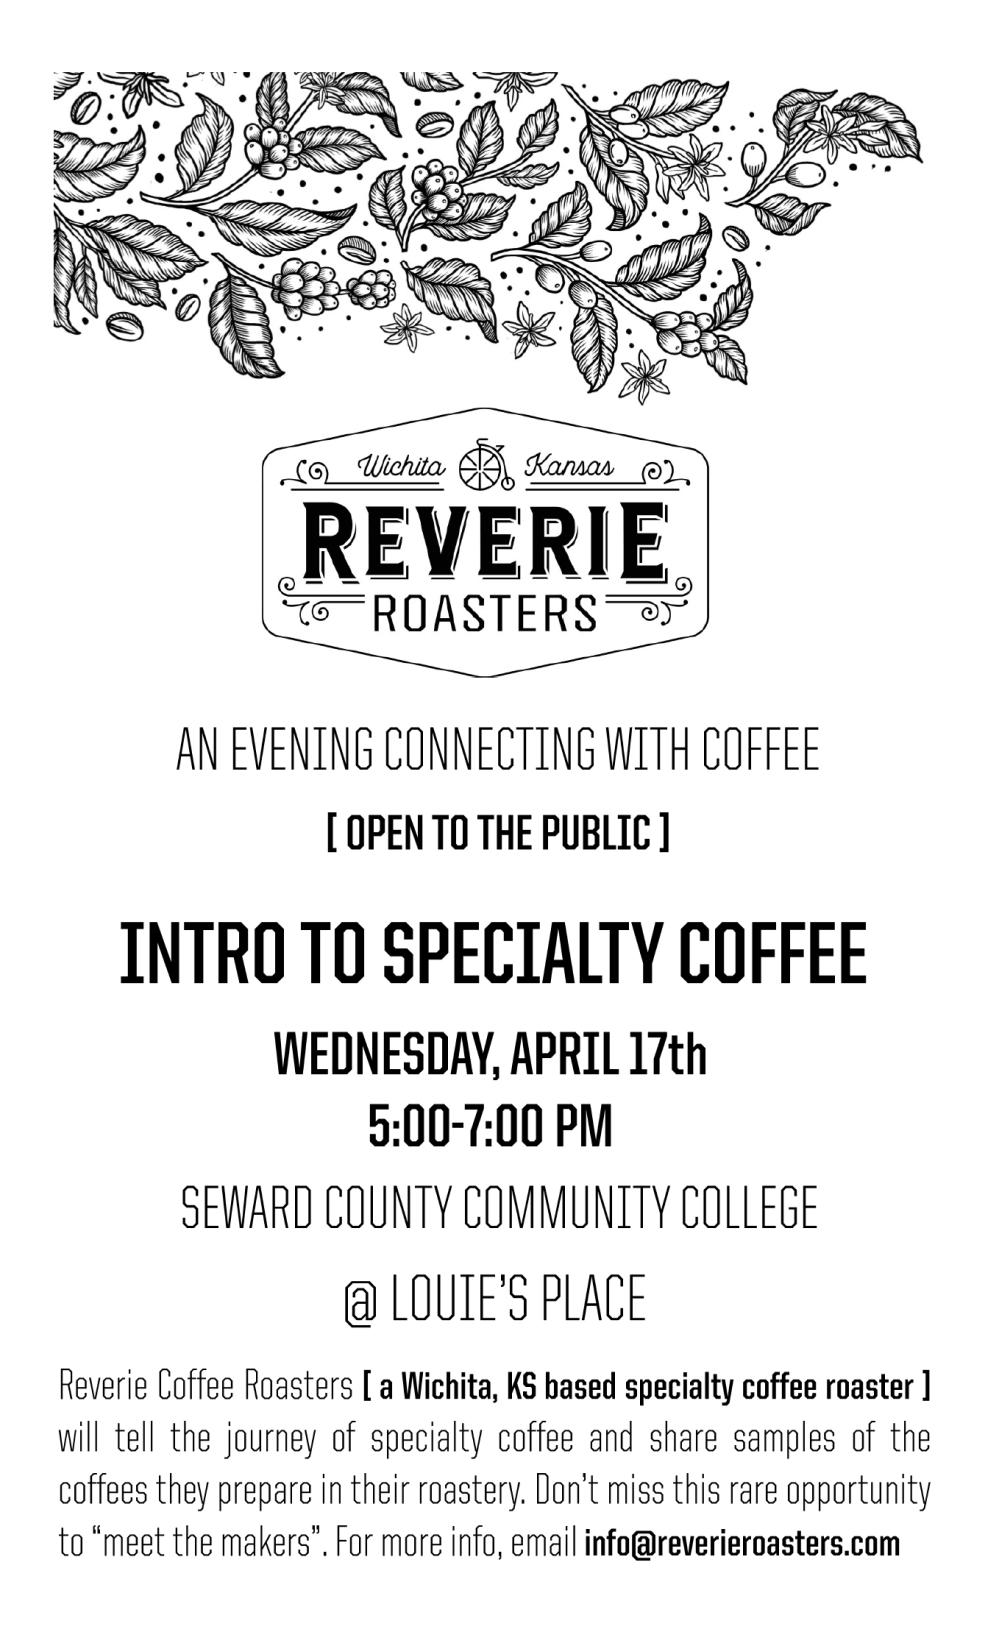 Reverie invite